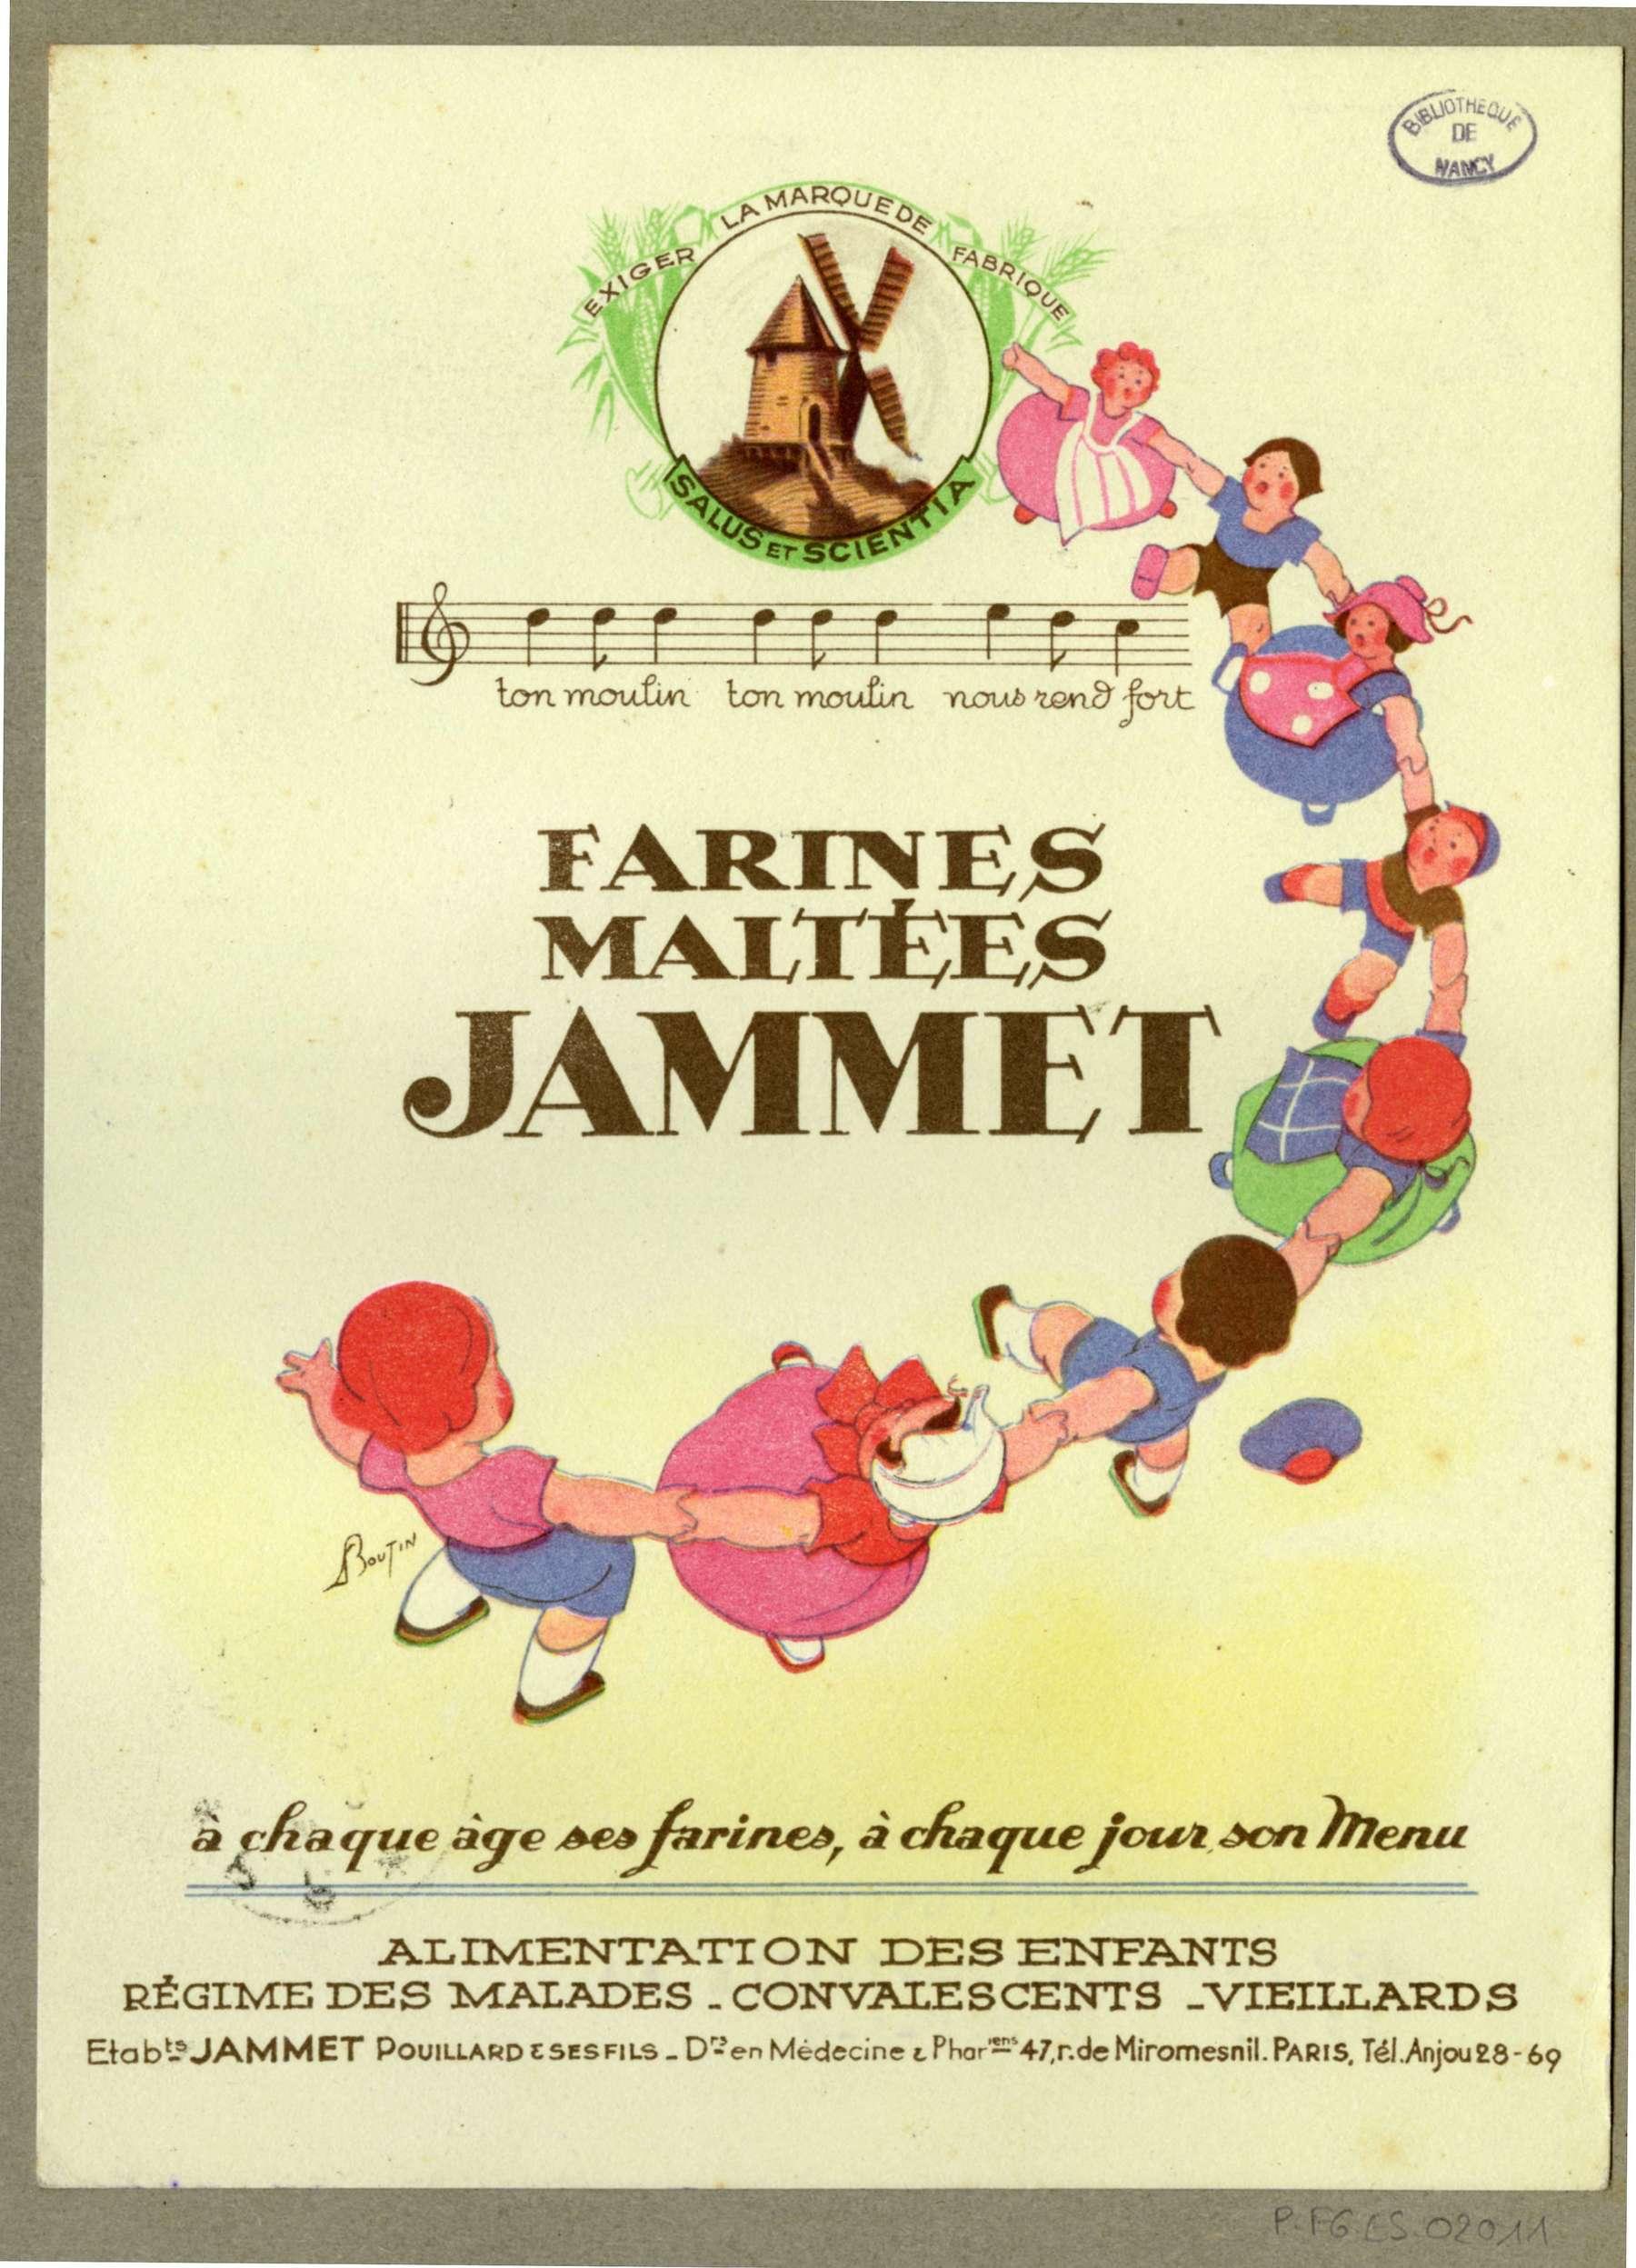 Contenu du Farines maltées Jammet